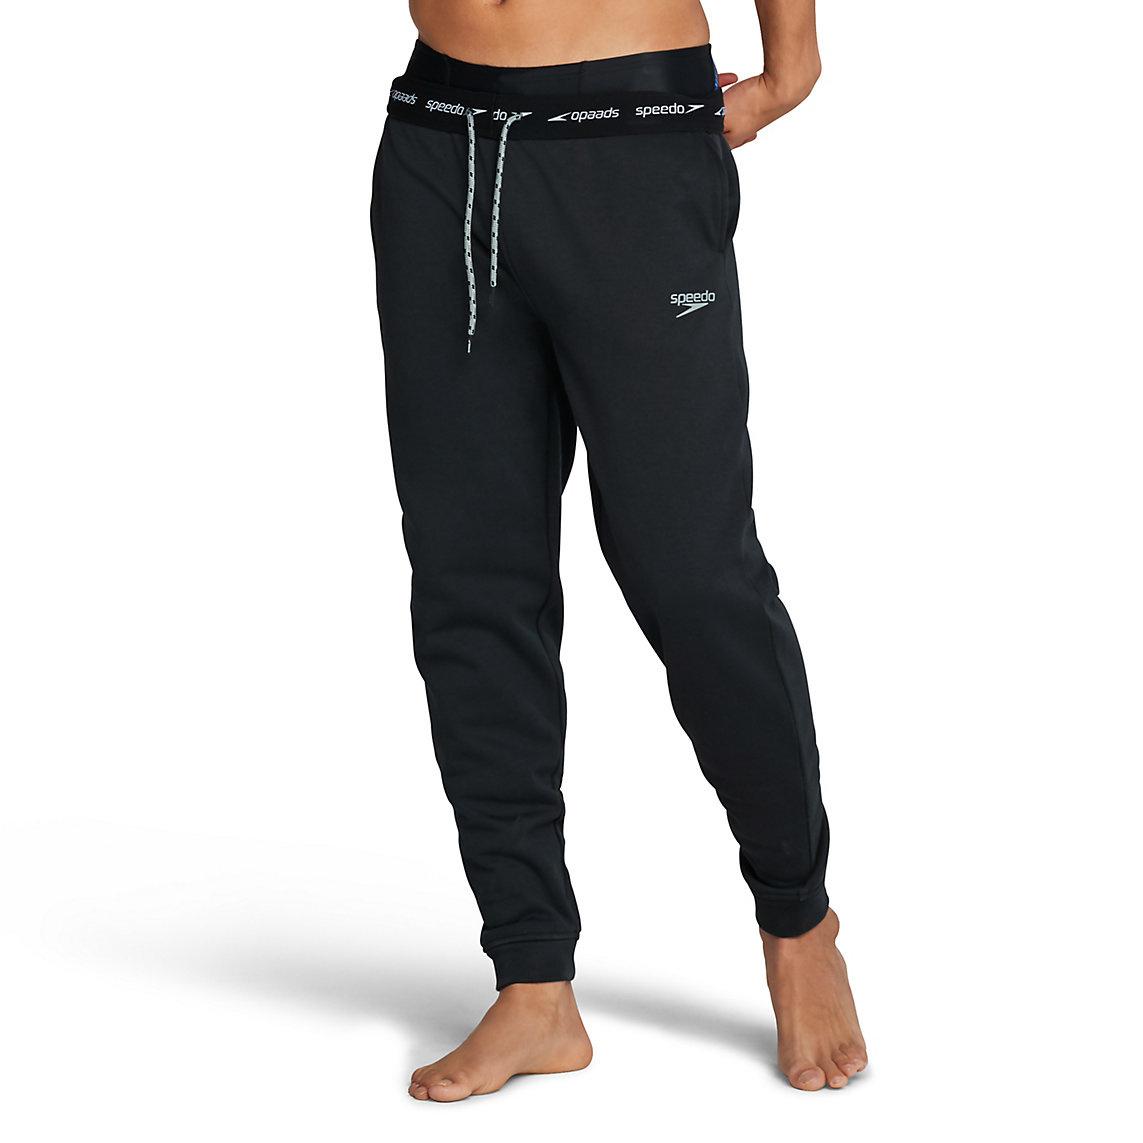 Circle C Select Team Pants